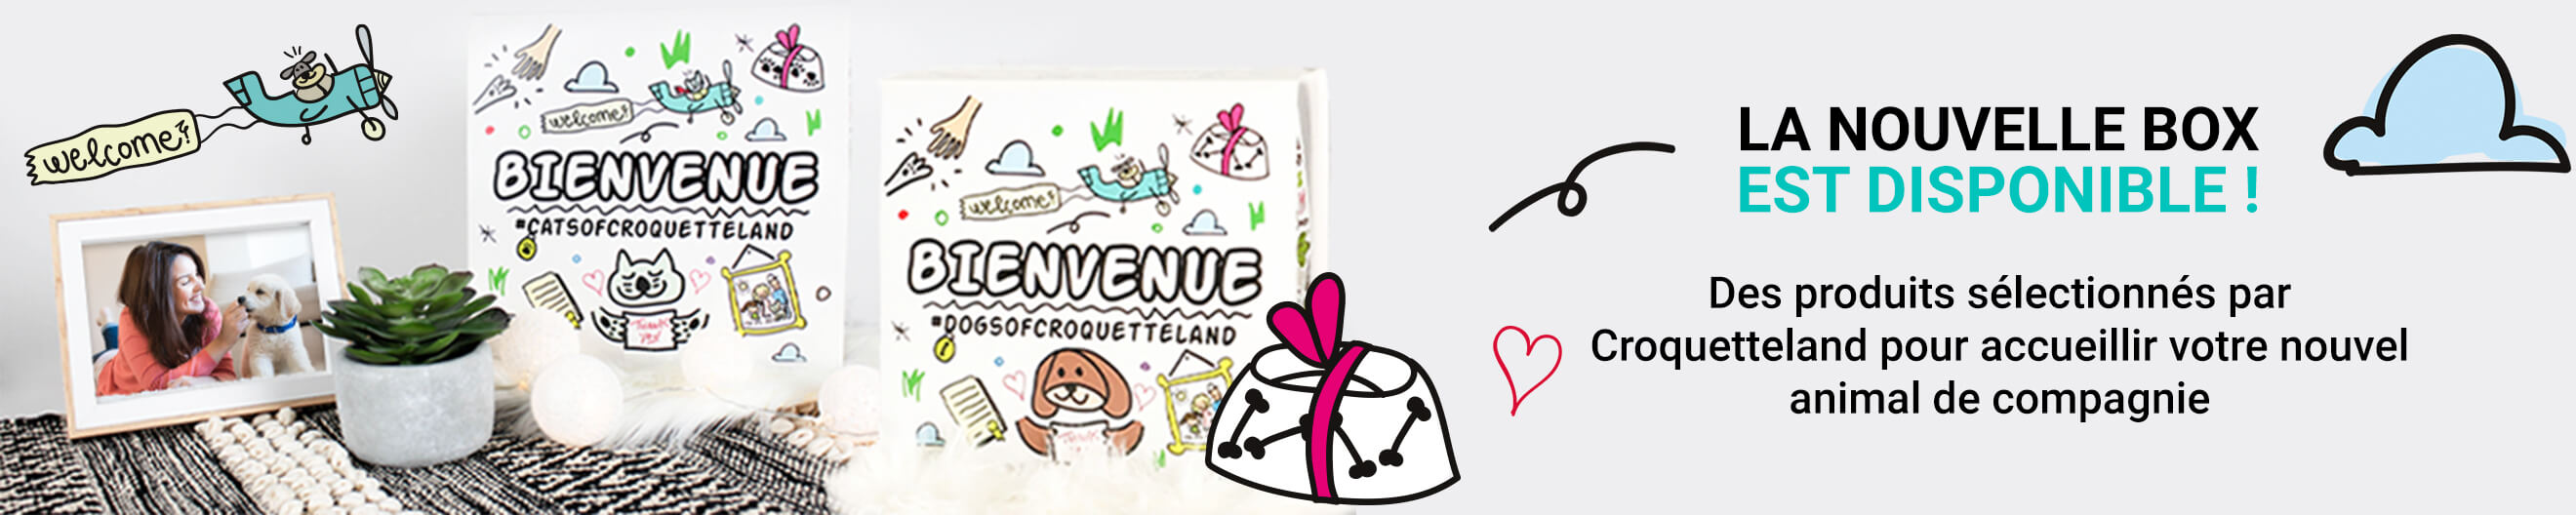 Box bienvenue croquetteland Carrefour